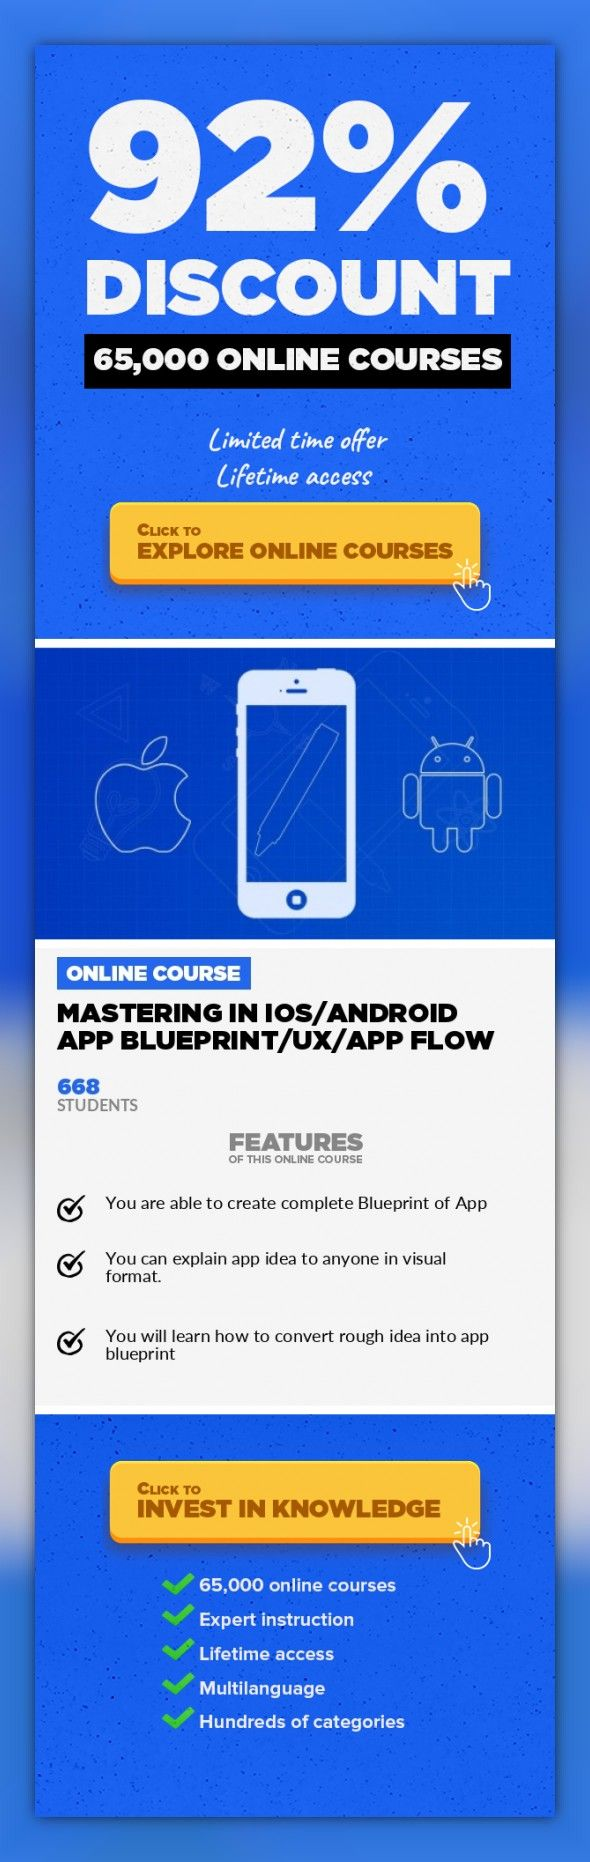 Mastering in iosandroid app blueprintuxapp flow mobile apps mastering in iosandroid app blueprintuxapp flow mobile apps development malvernweather Gallery